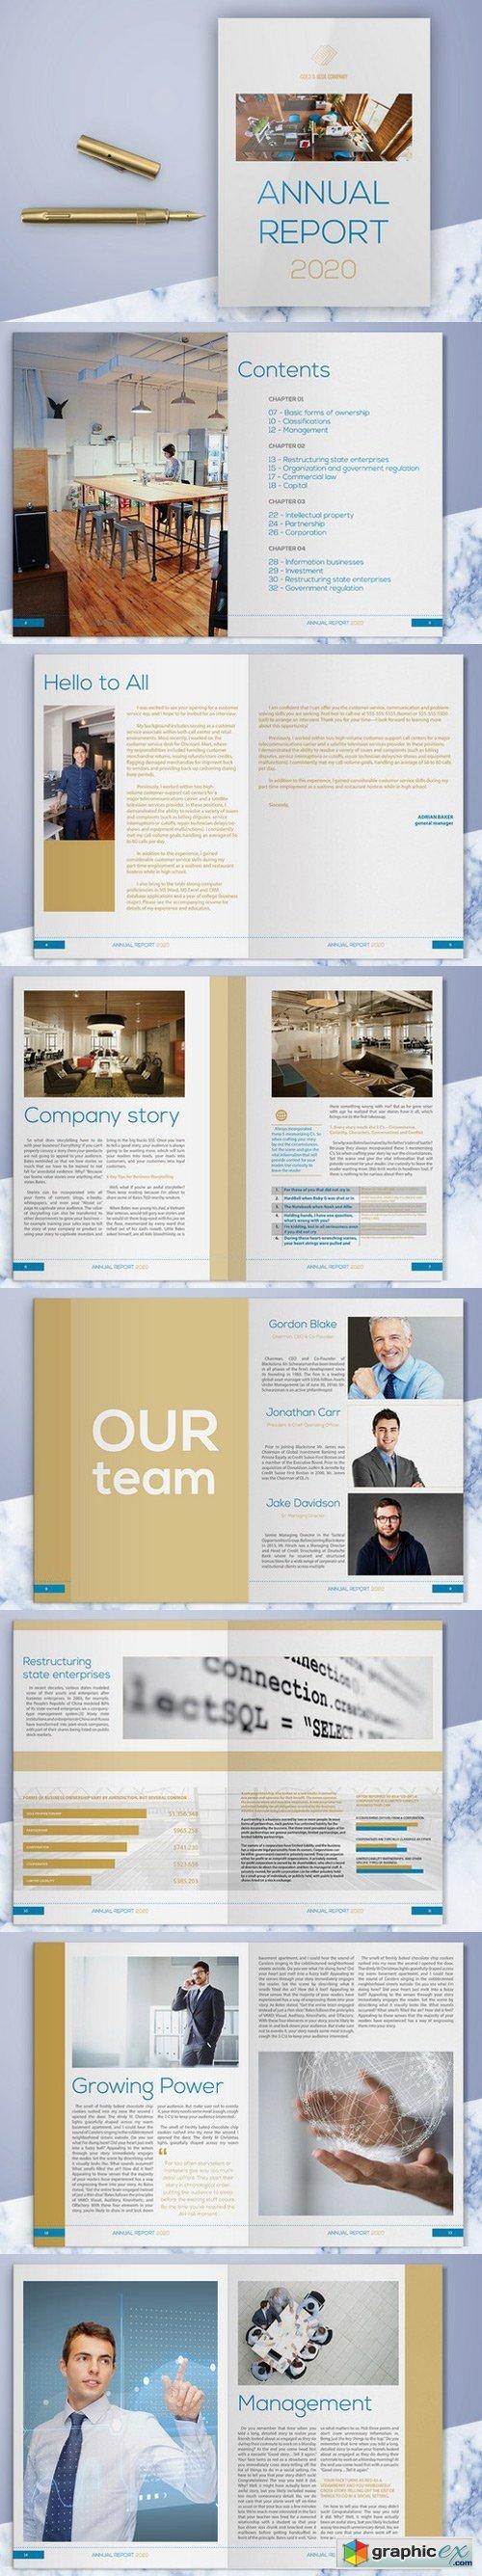 Gold and Blue Company Profile